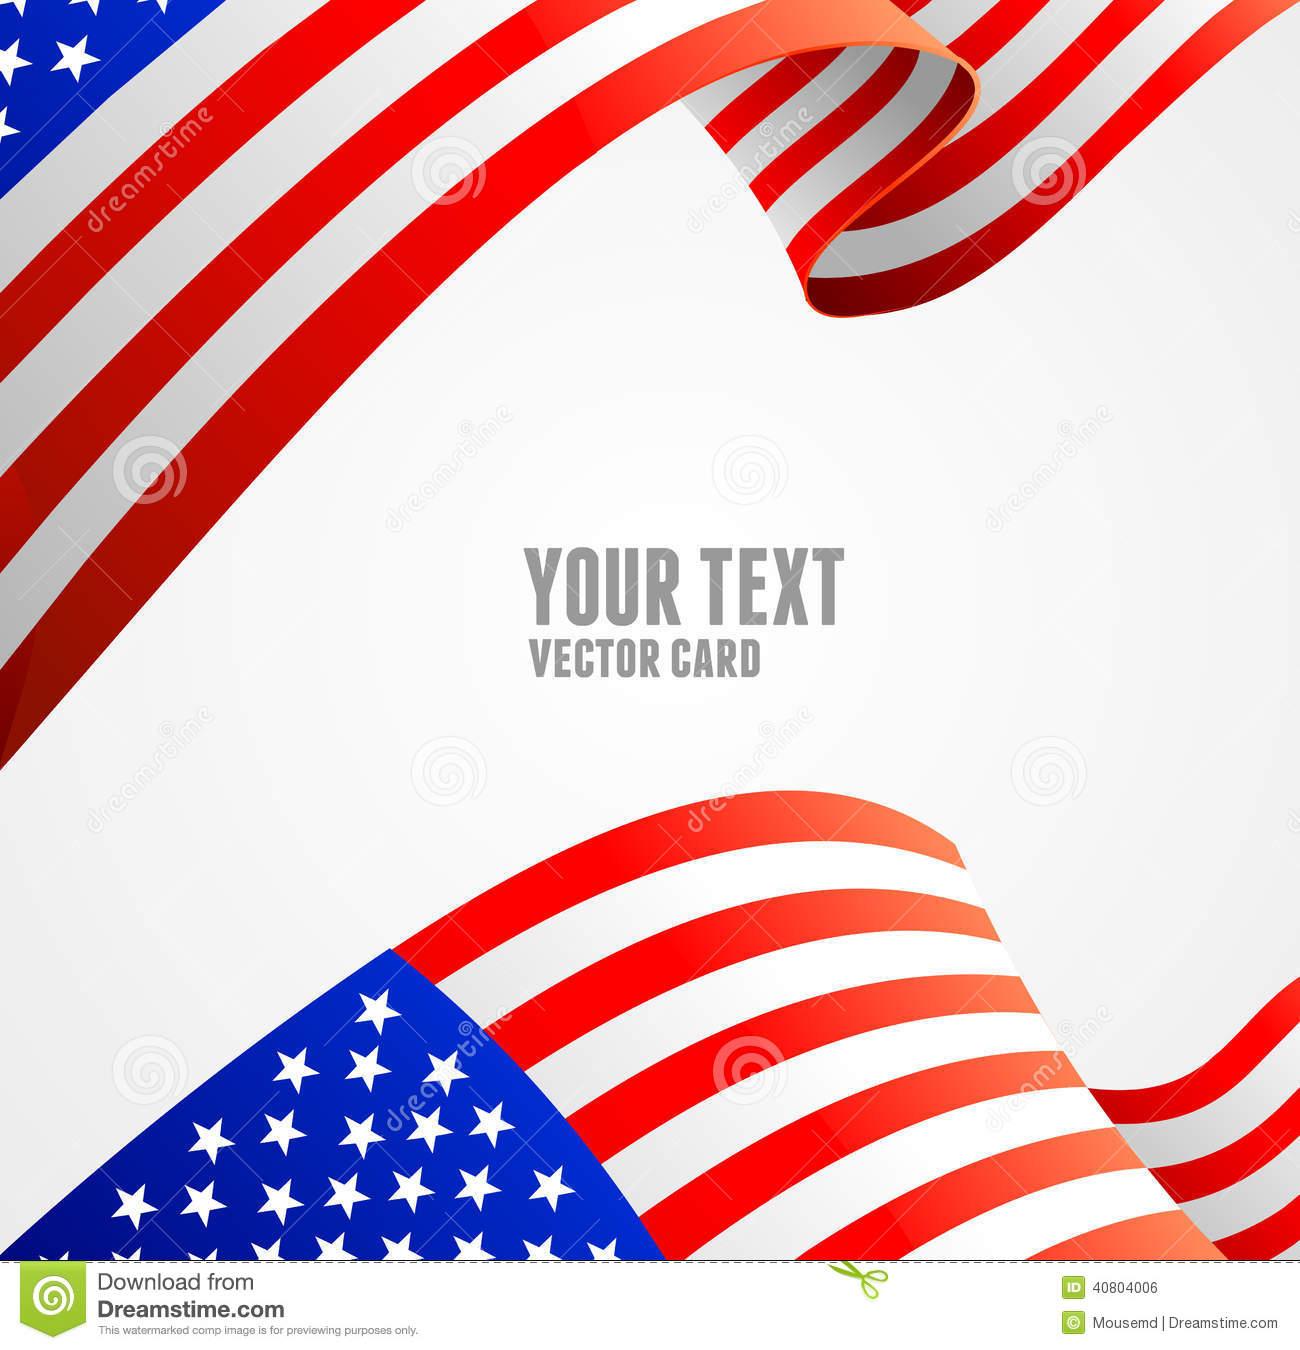 13 Patriotic Vector Borders Images